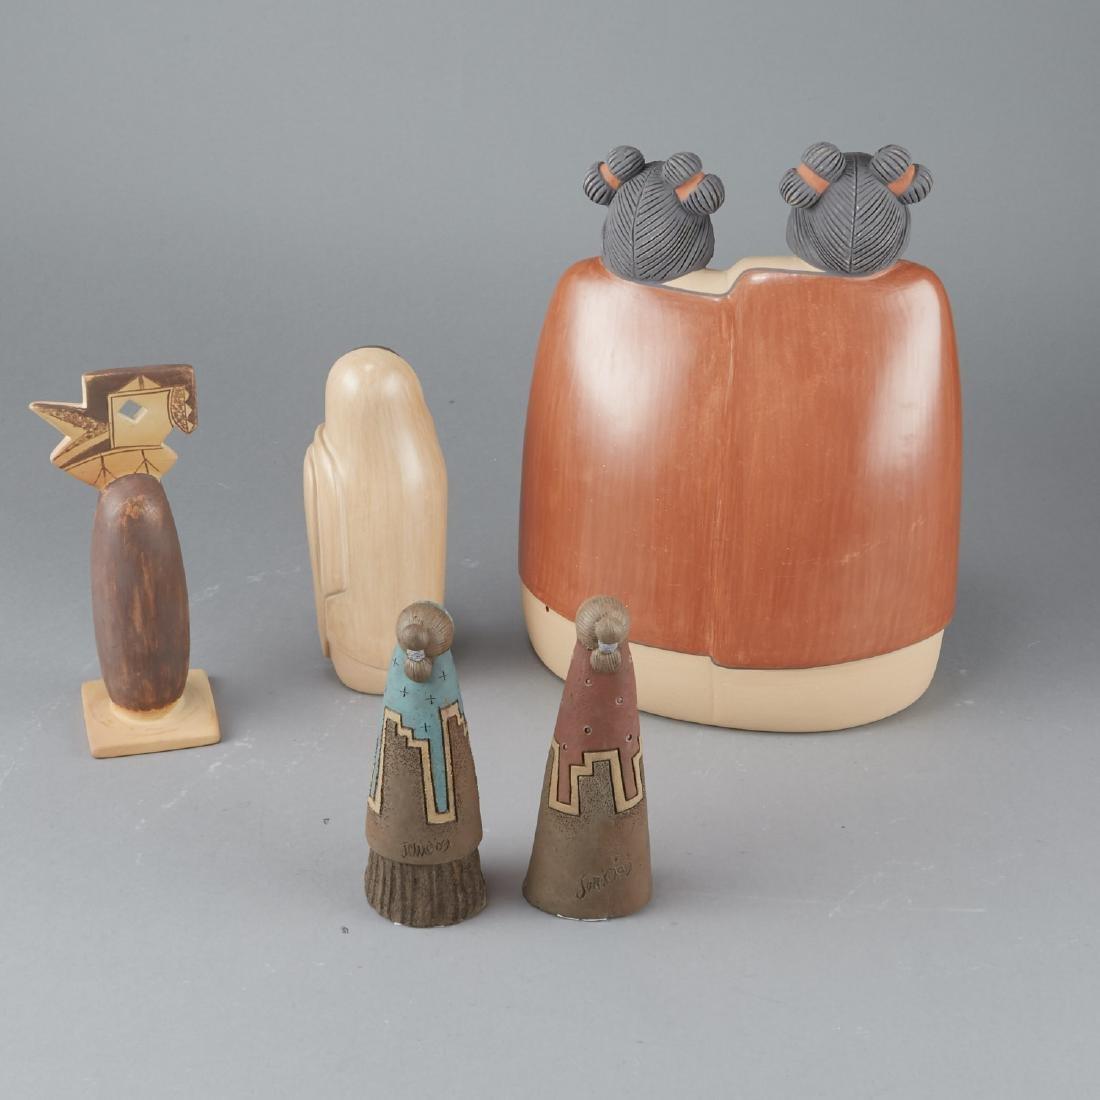 5 Native American Ceramic Woman Figures - 2